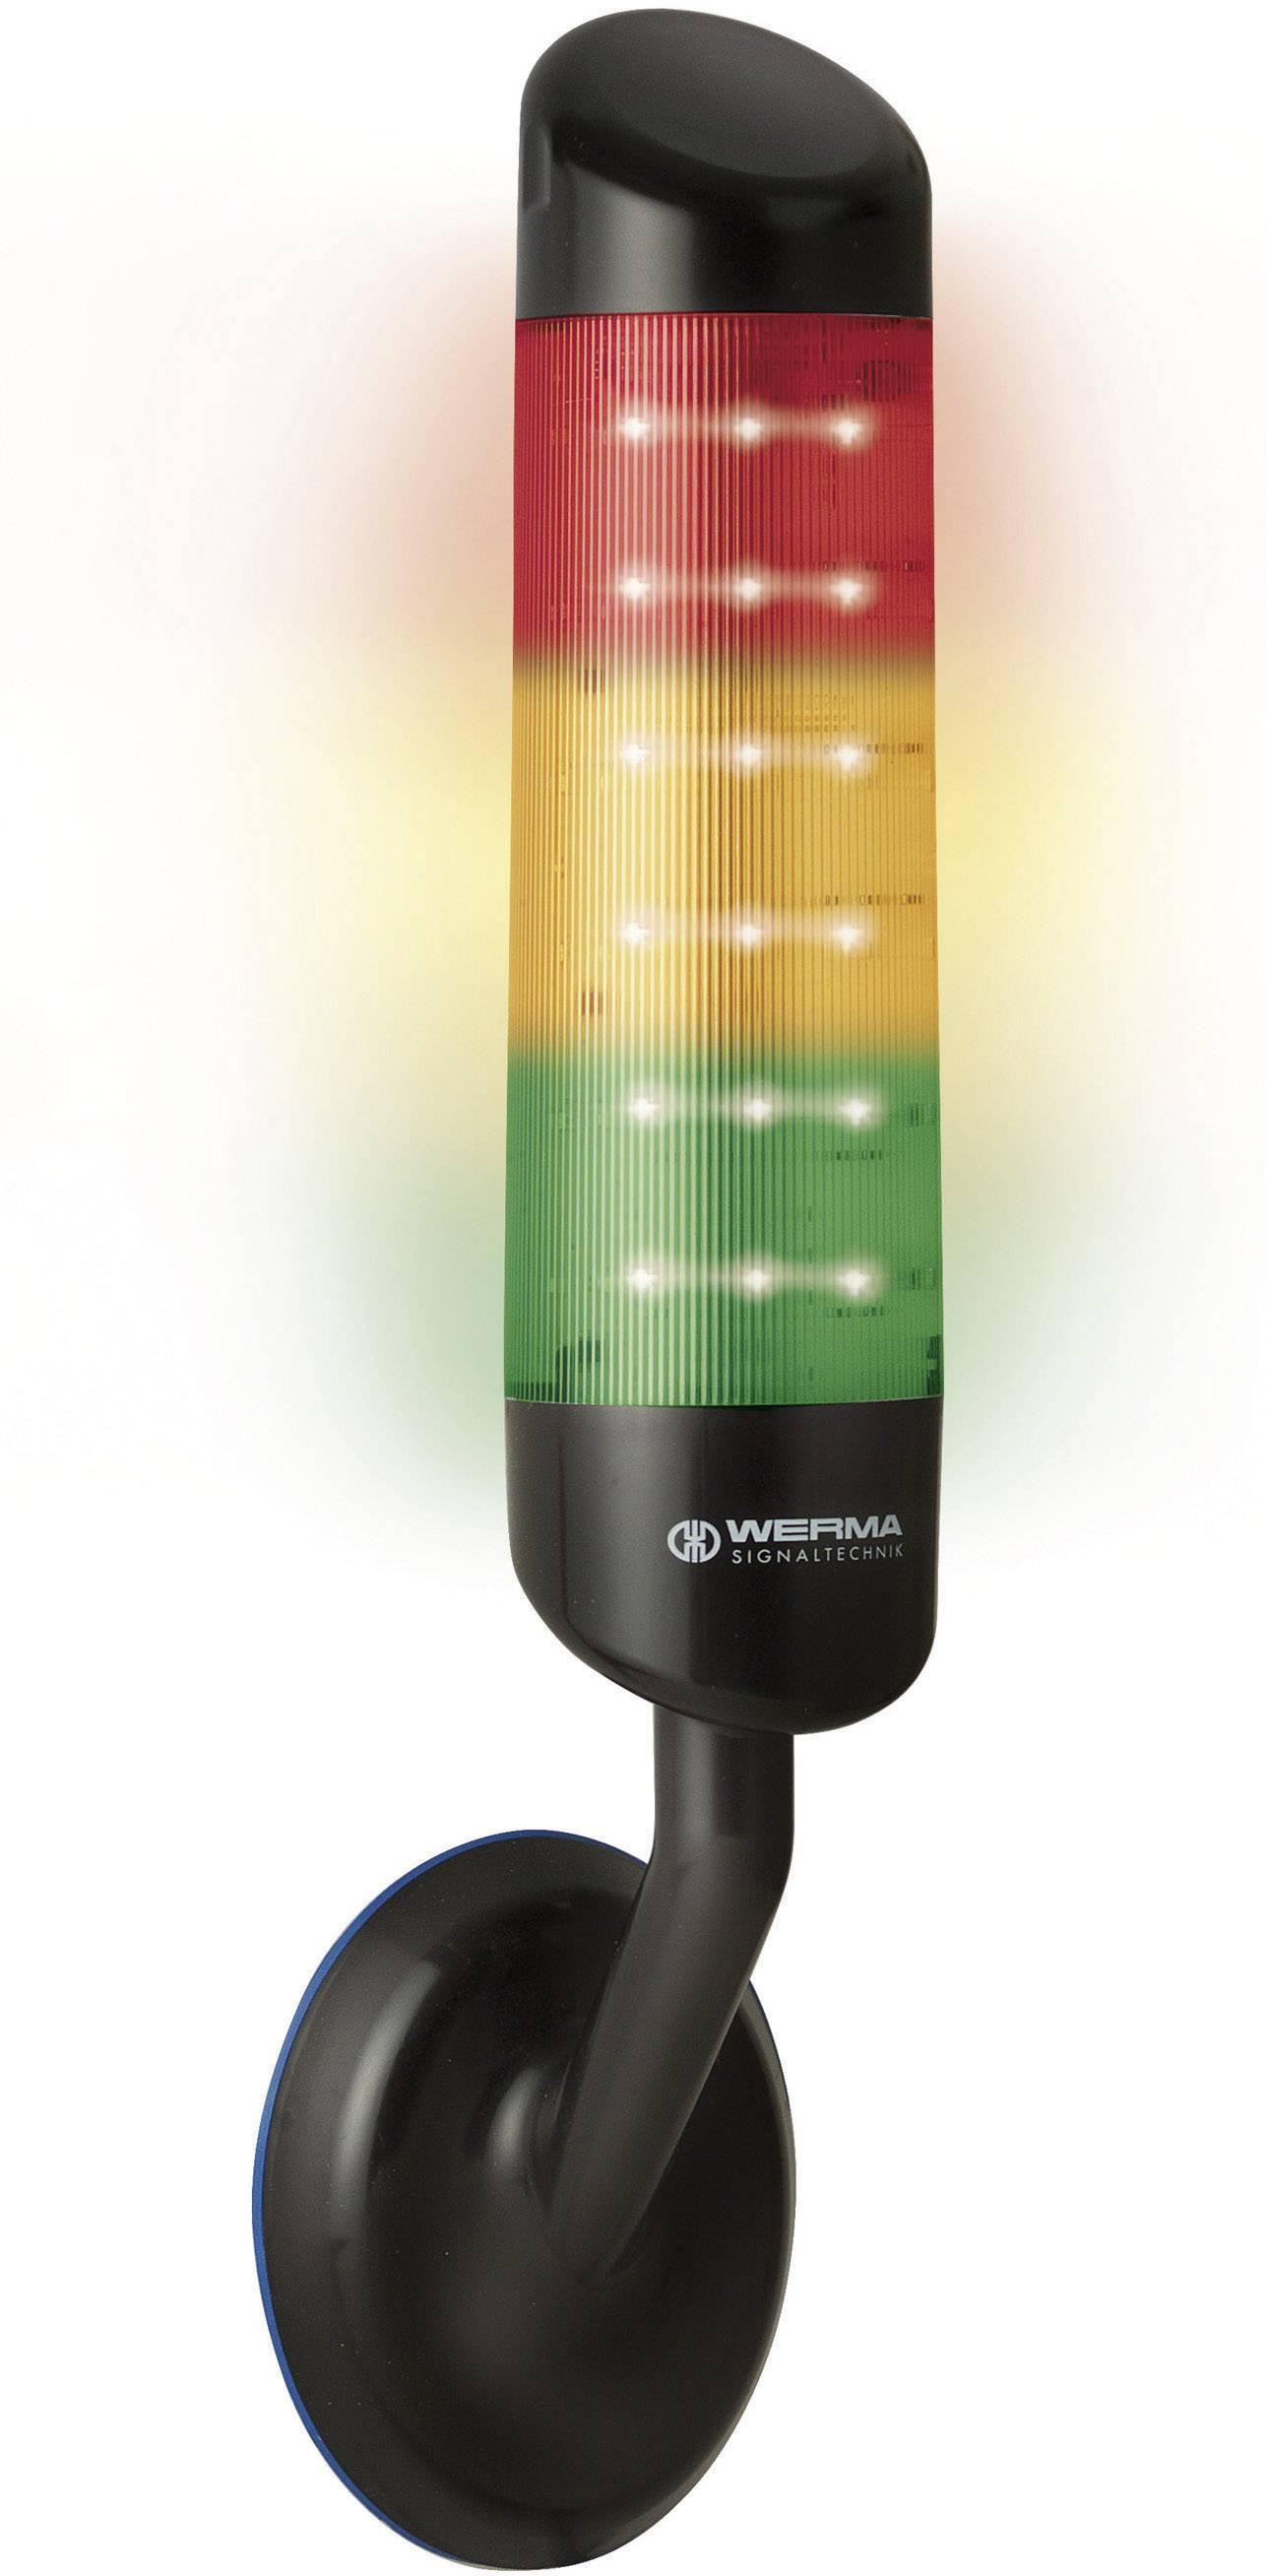 Signalizačný stĺpik Werma Signaltechnik 695.300.55, 85 dB, 24 V/DC, červená, žltá, zelená